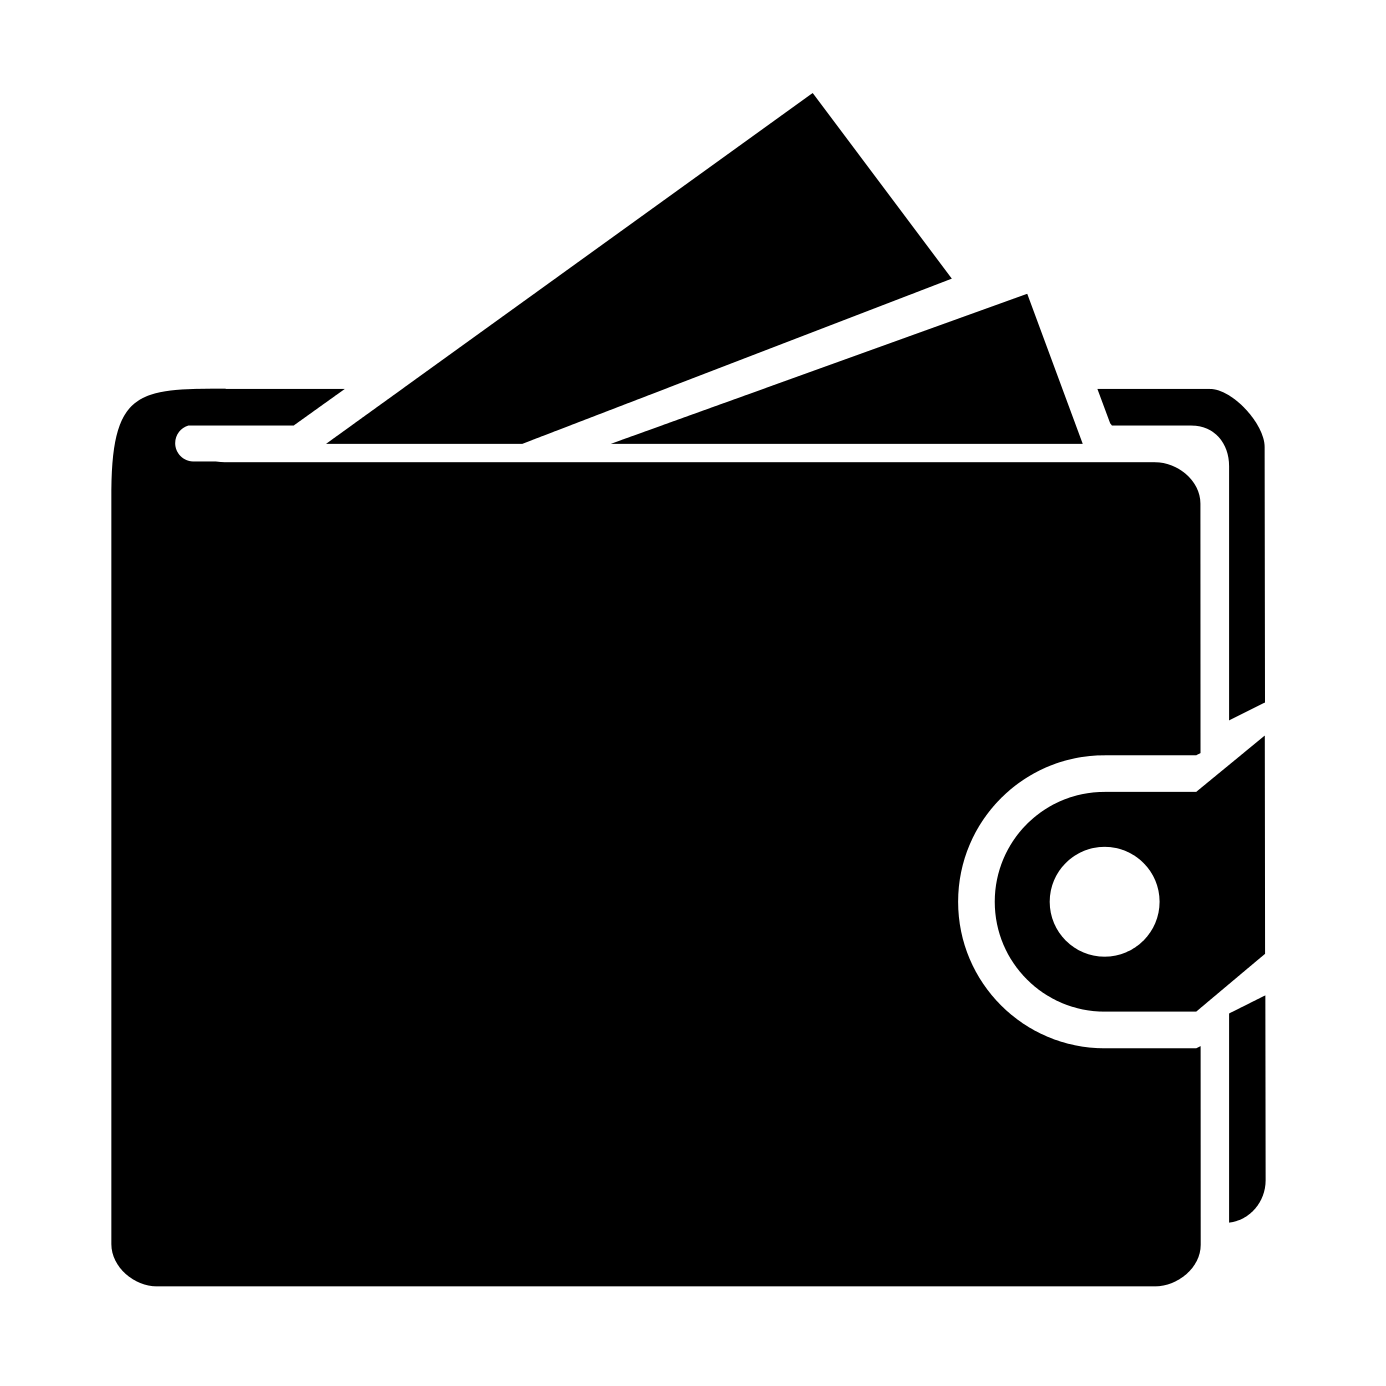 Картинки по запросу кошелек вектор